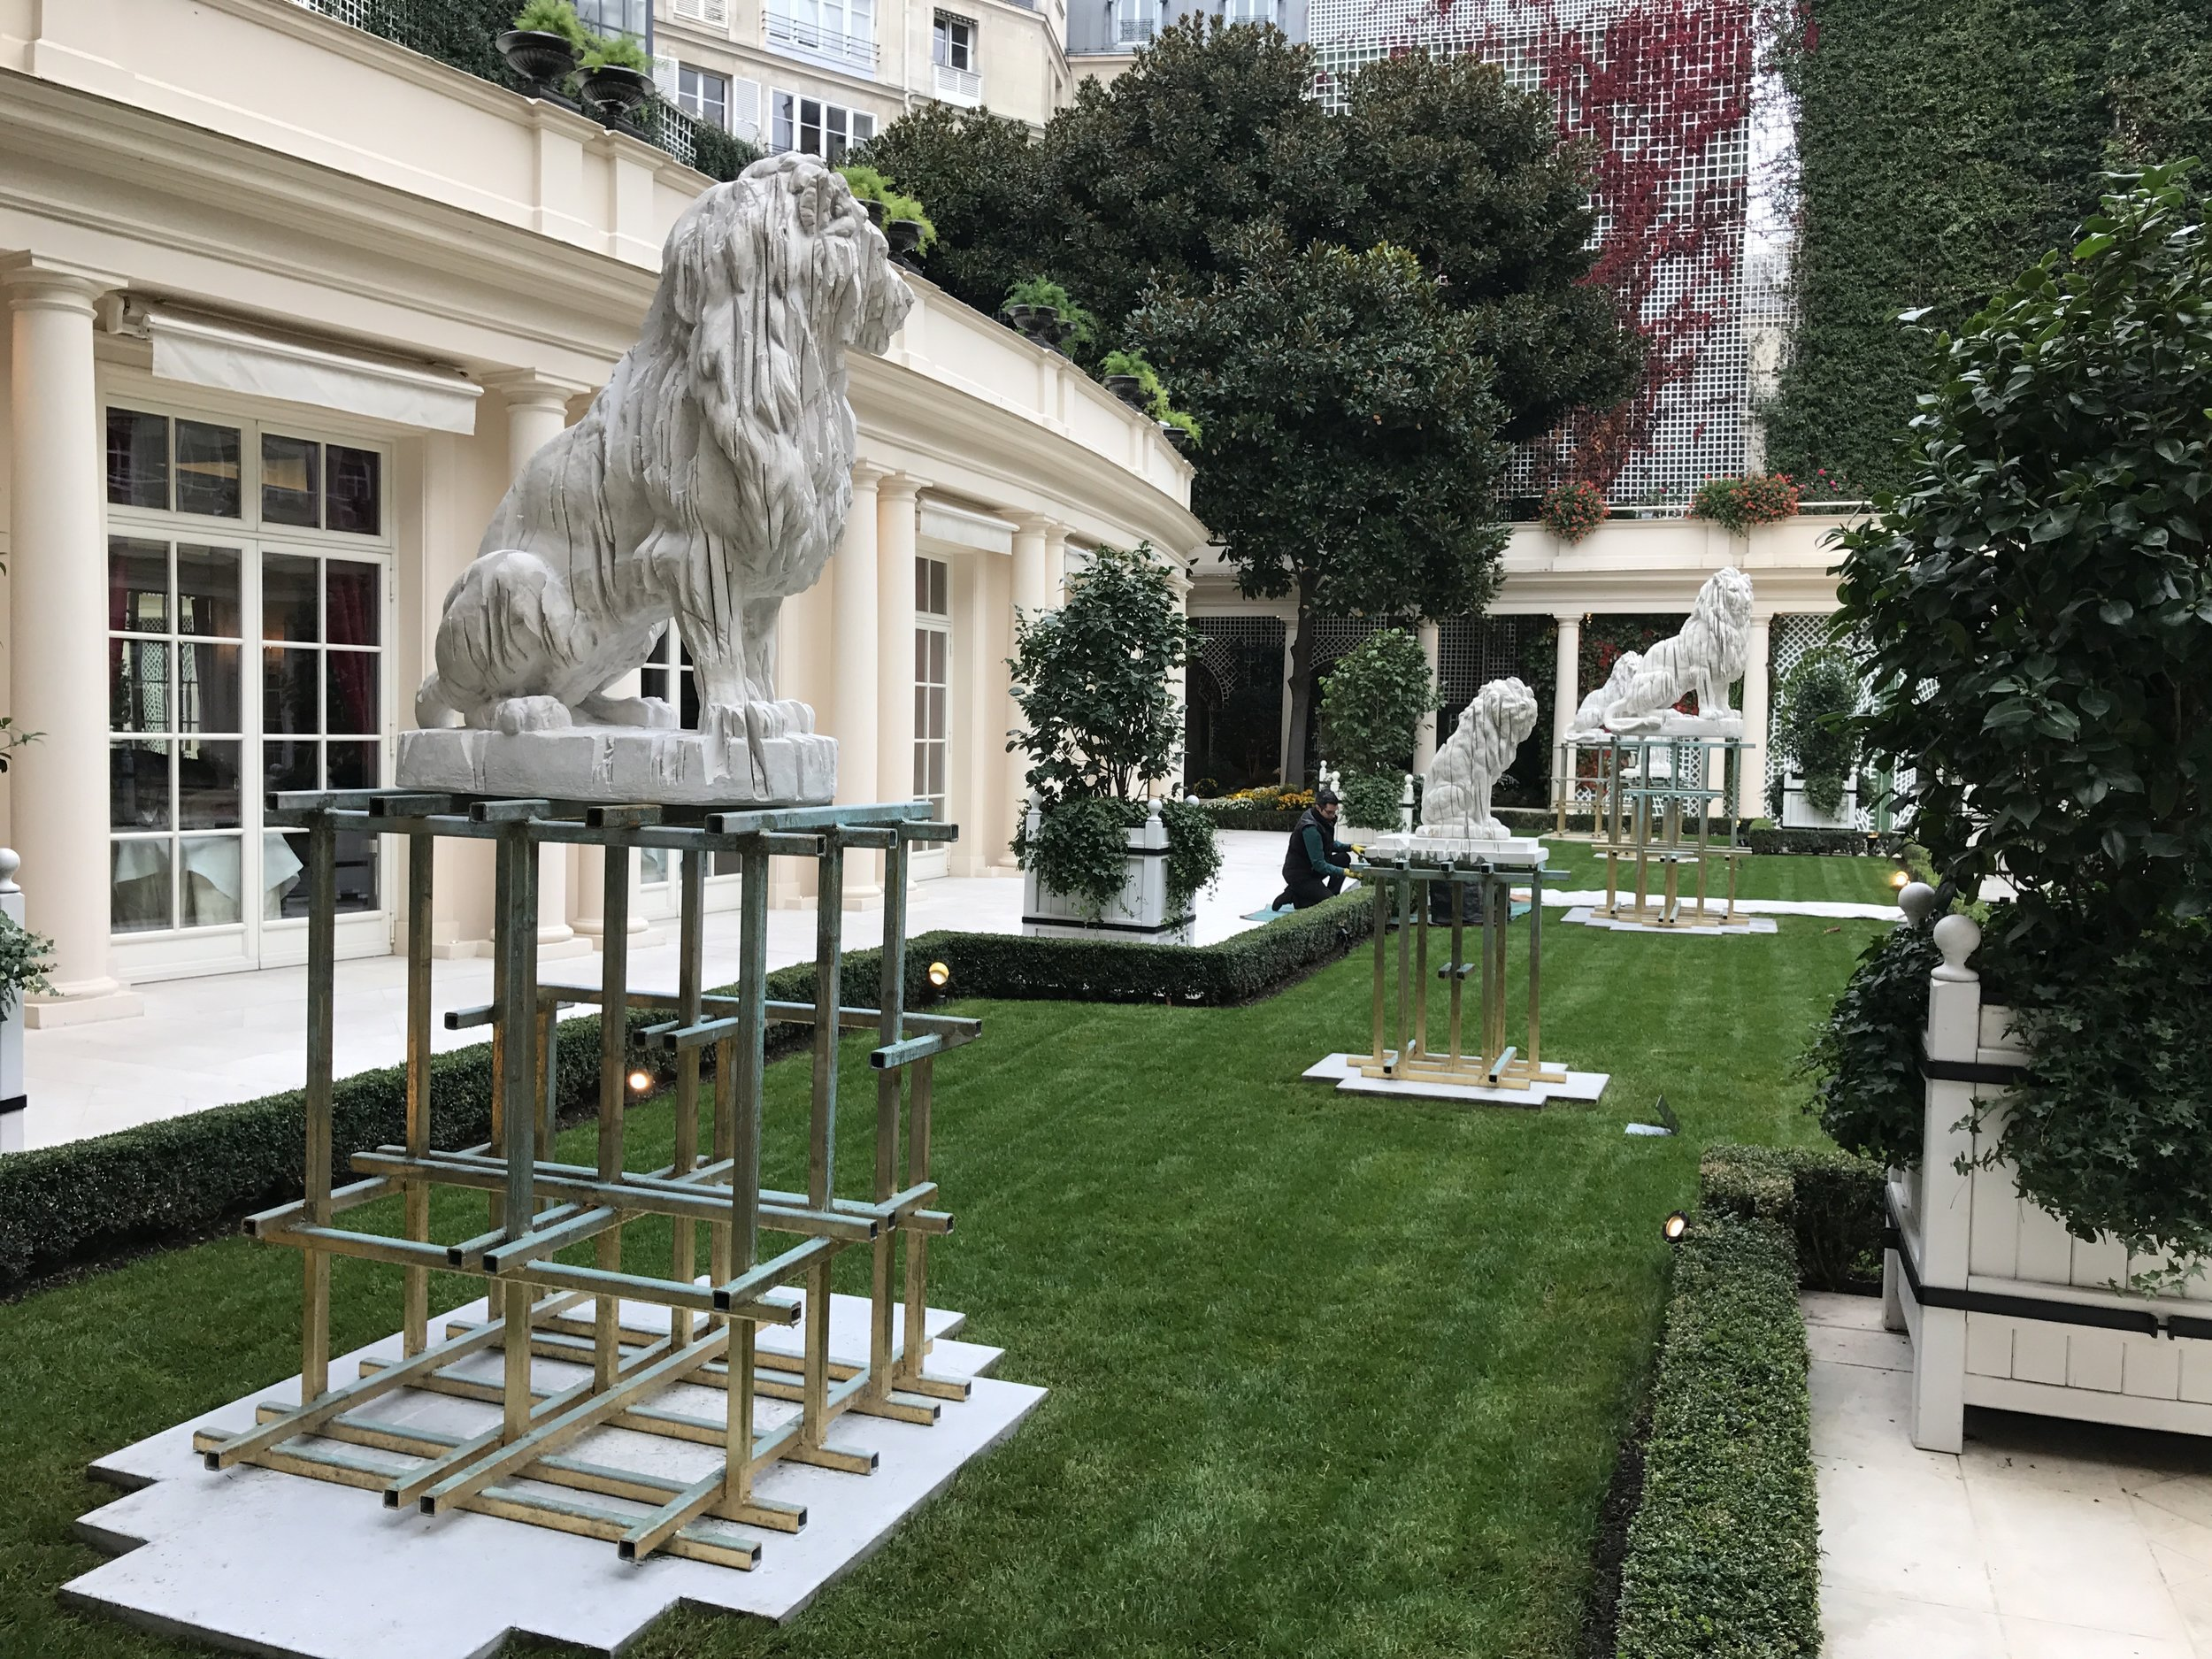 Relax in the welcoming outdoor gardens